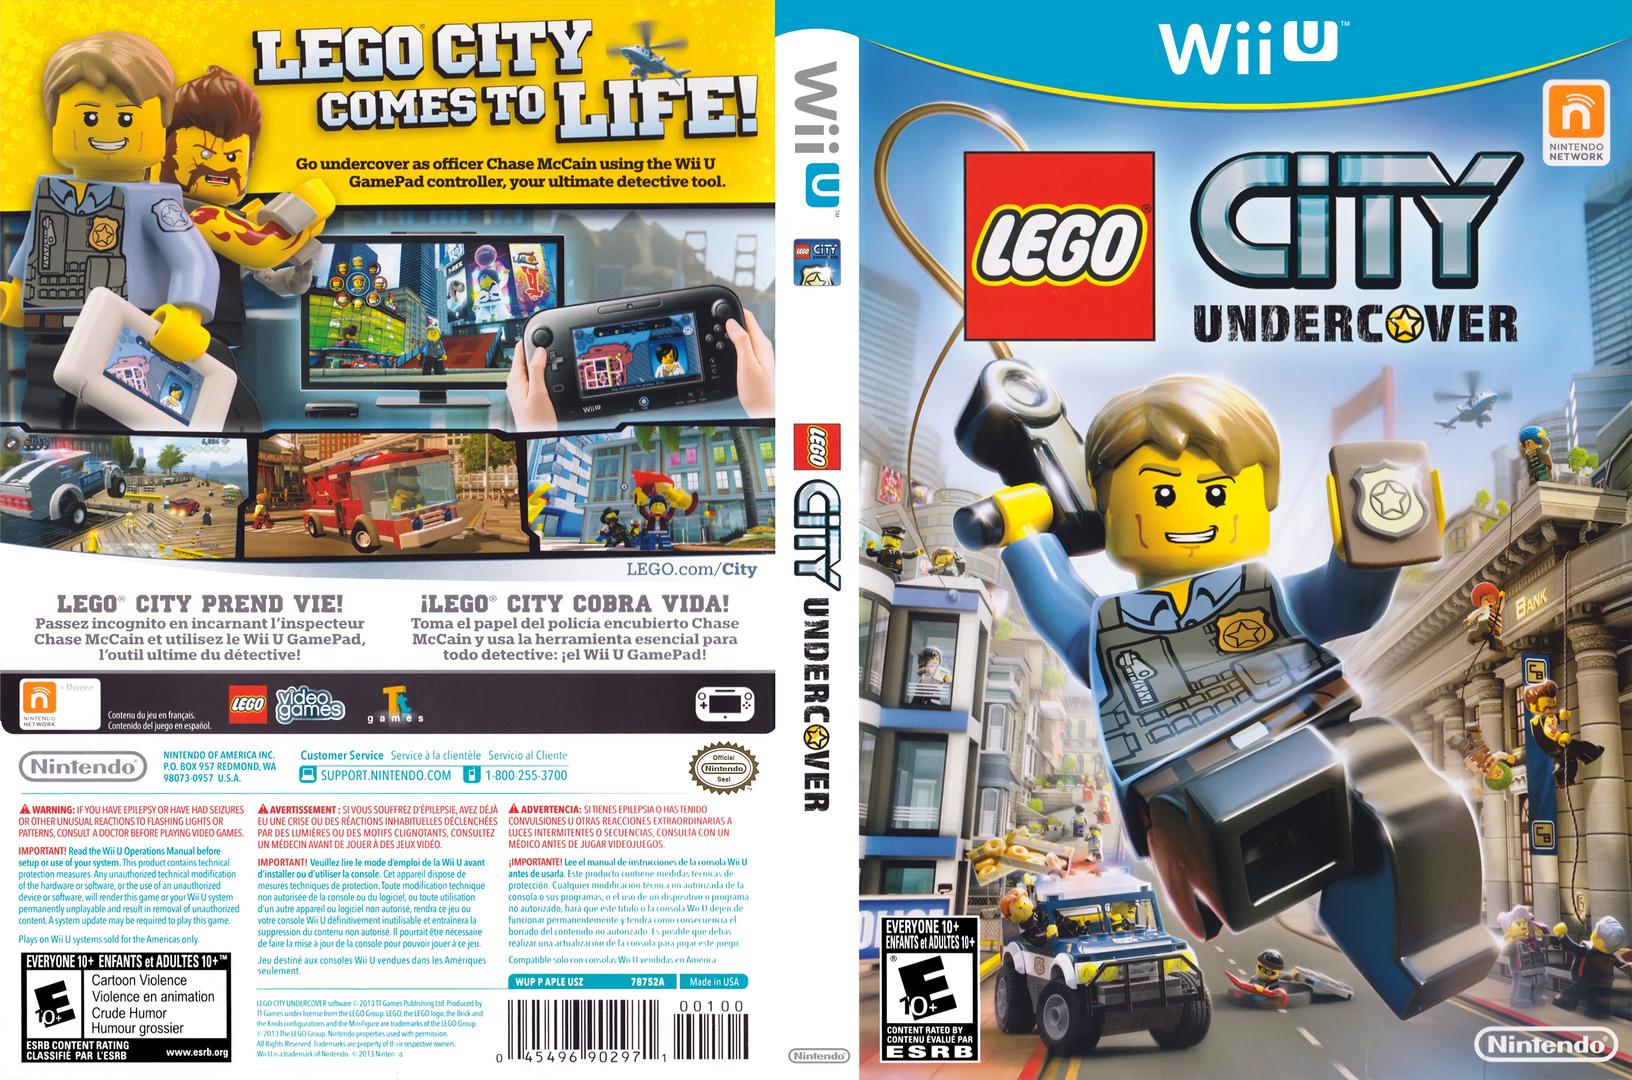 LEGO City Undercover WiiU coverfullHQ (APLE01)